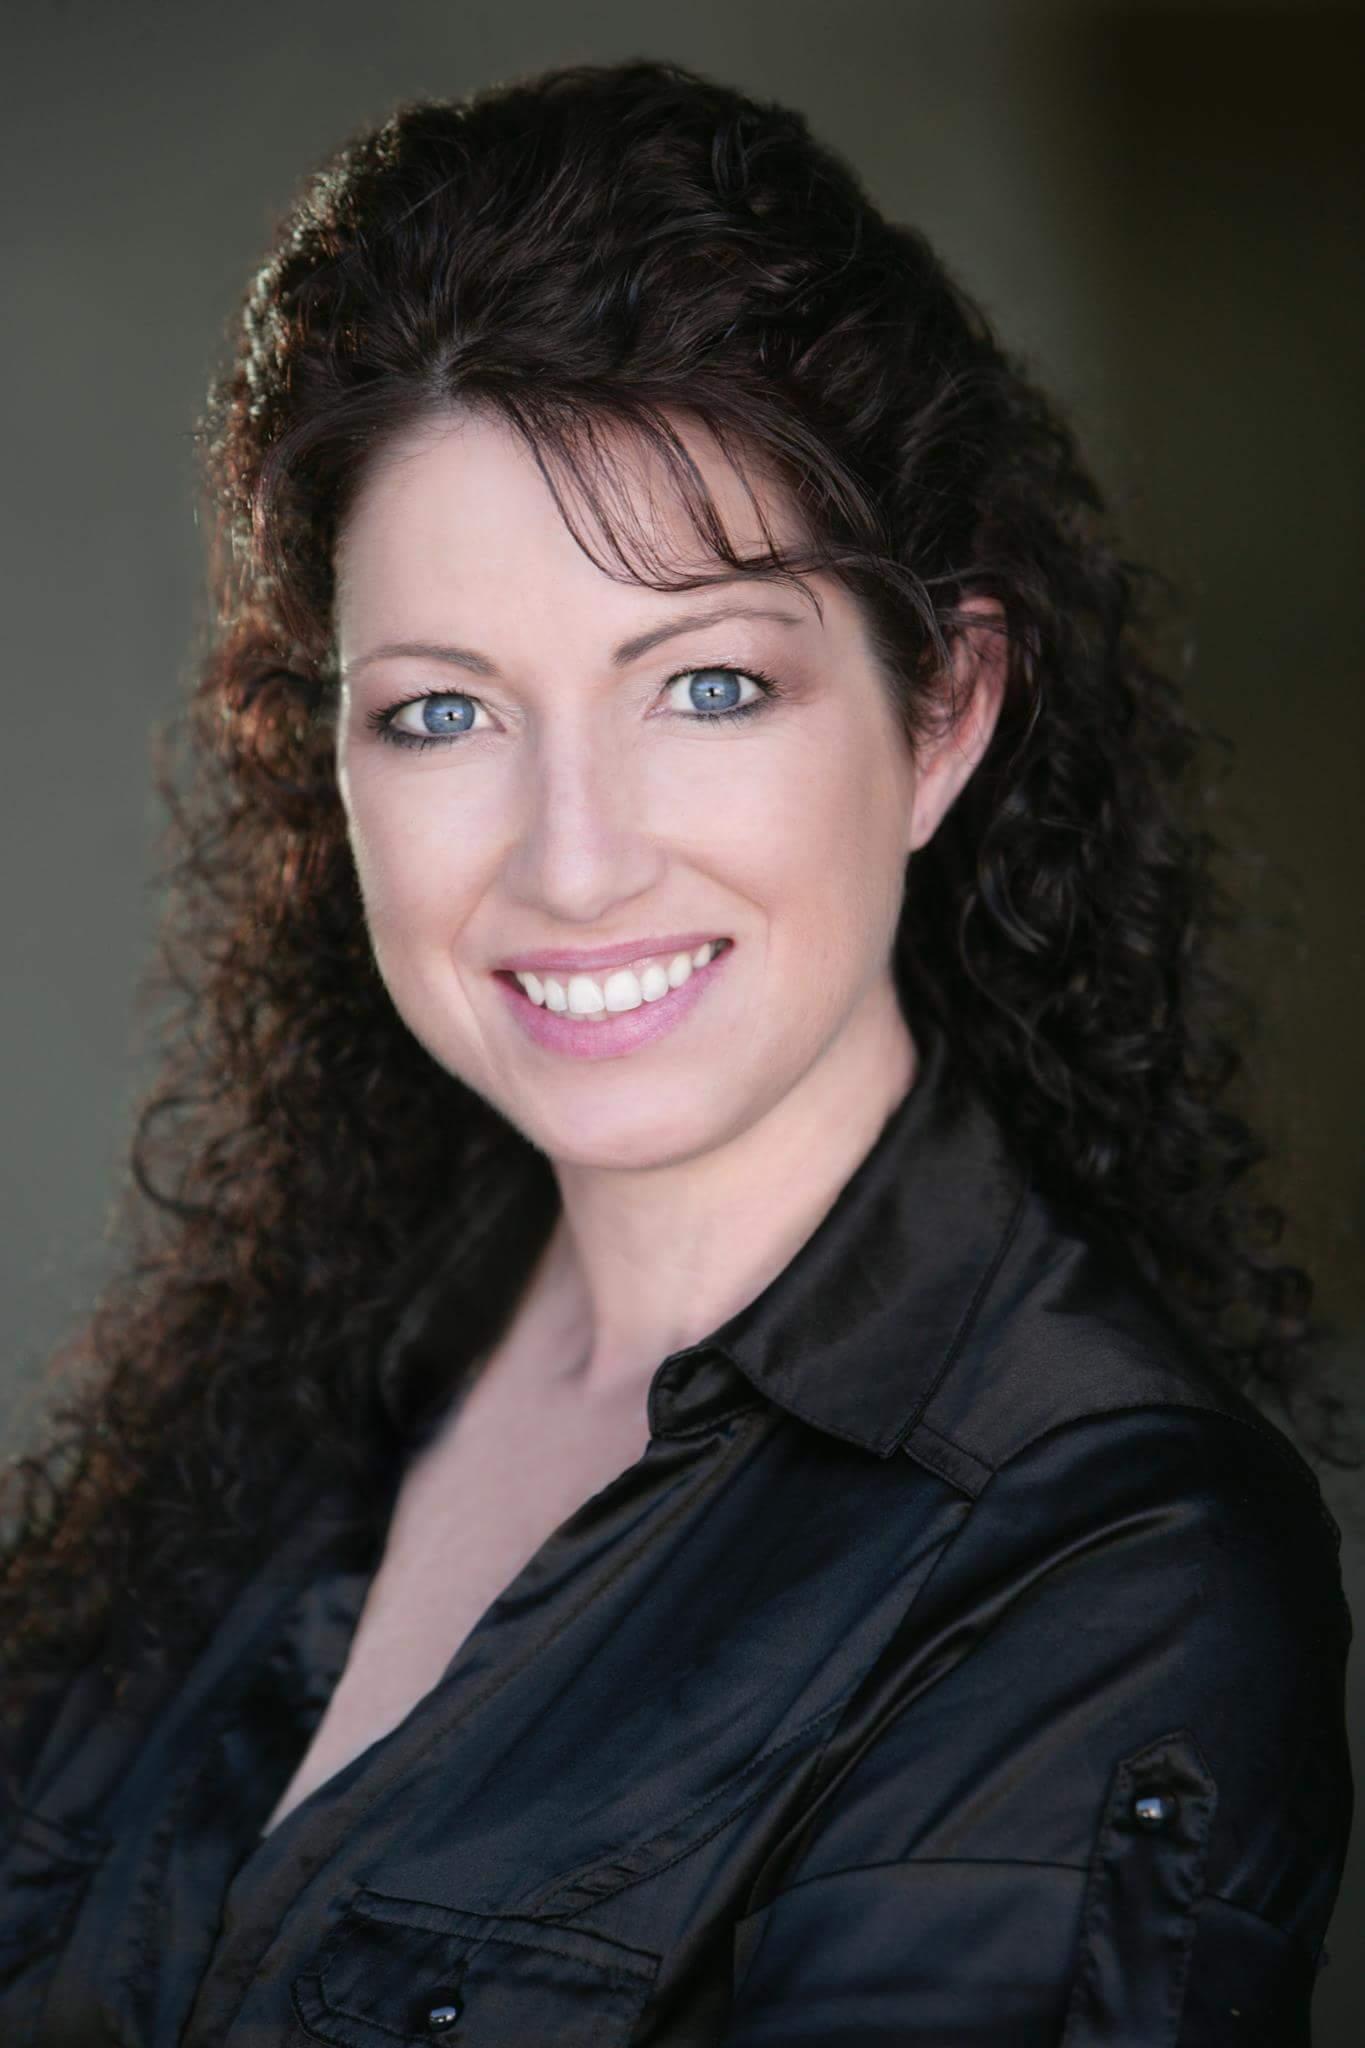 Samantha Harlan